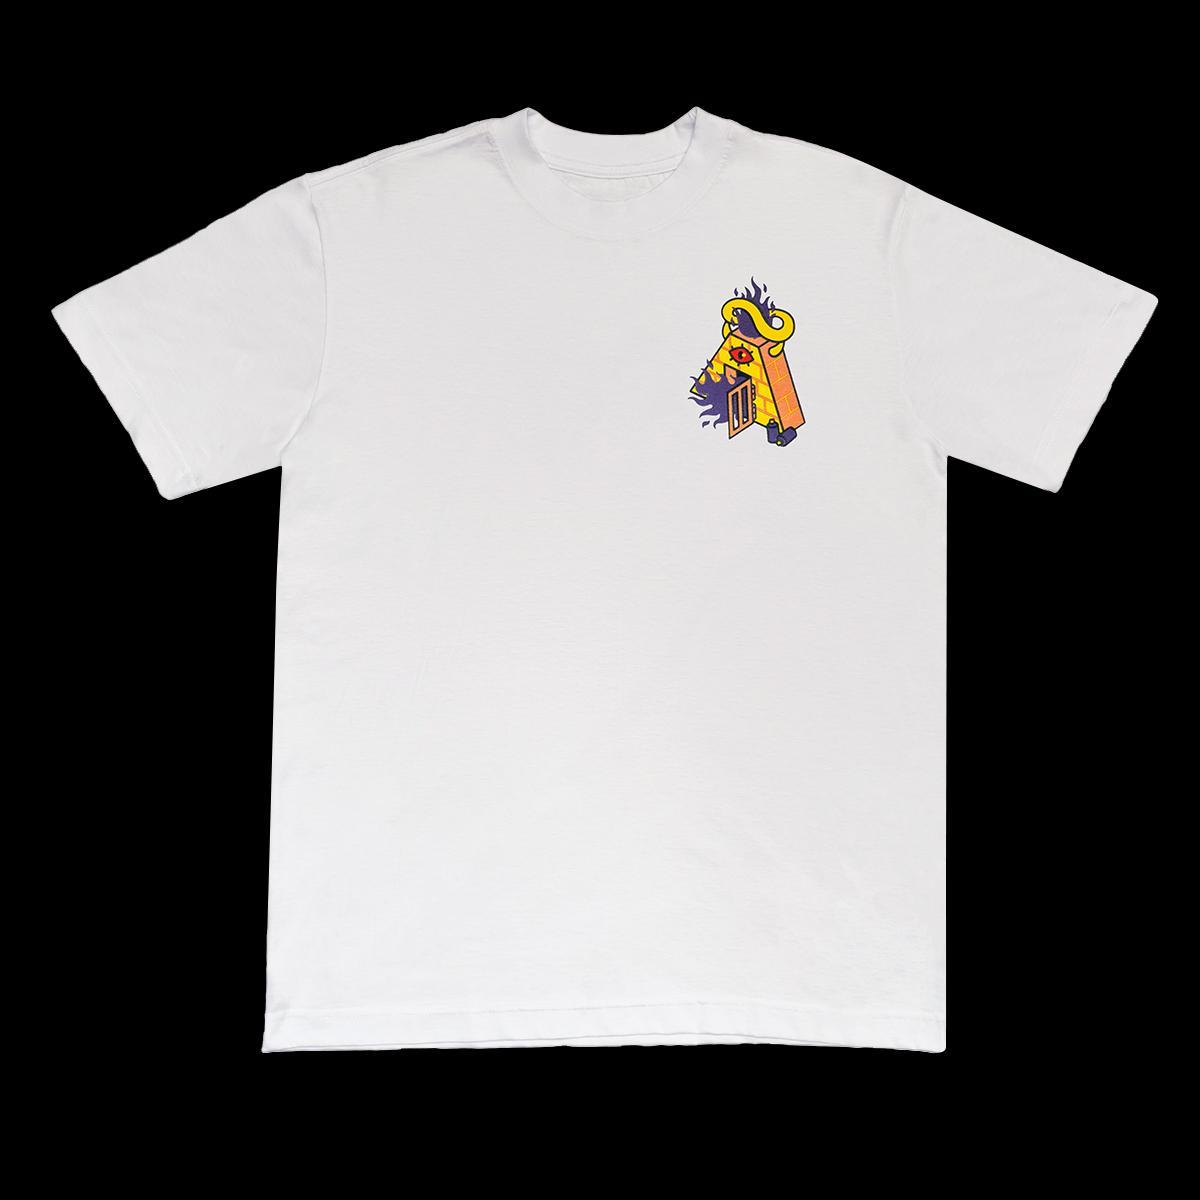 Camiseta a novos artistas -  devil branco